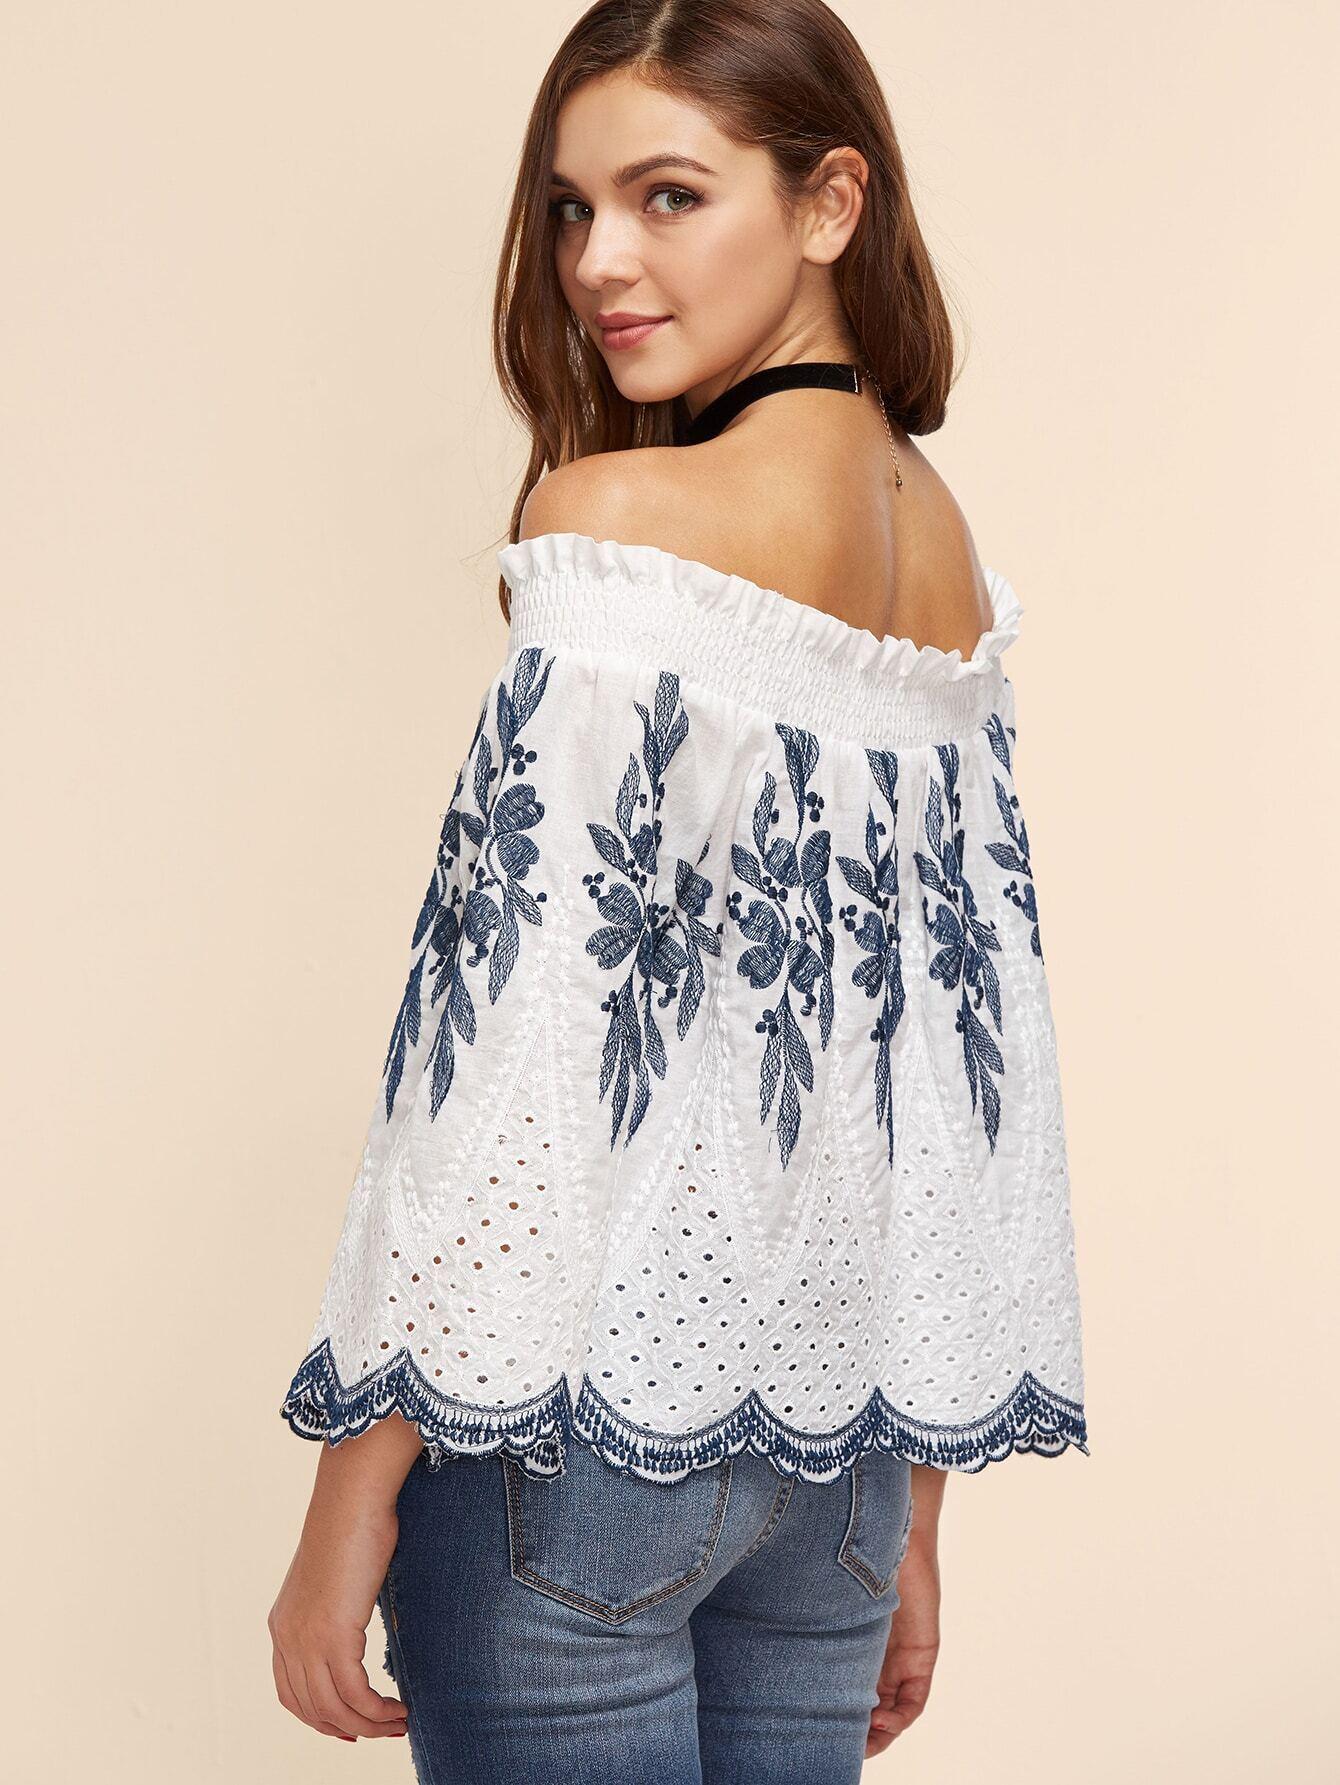 blouse161108599_2